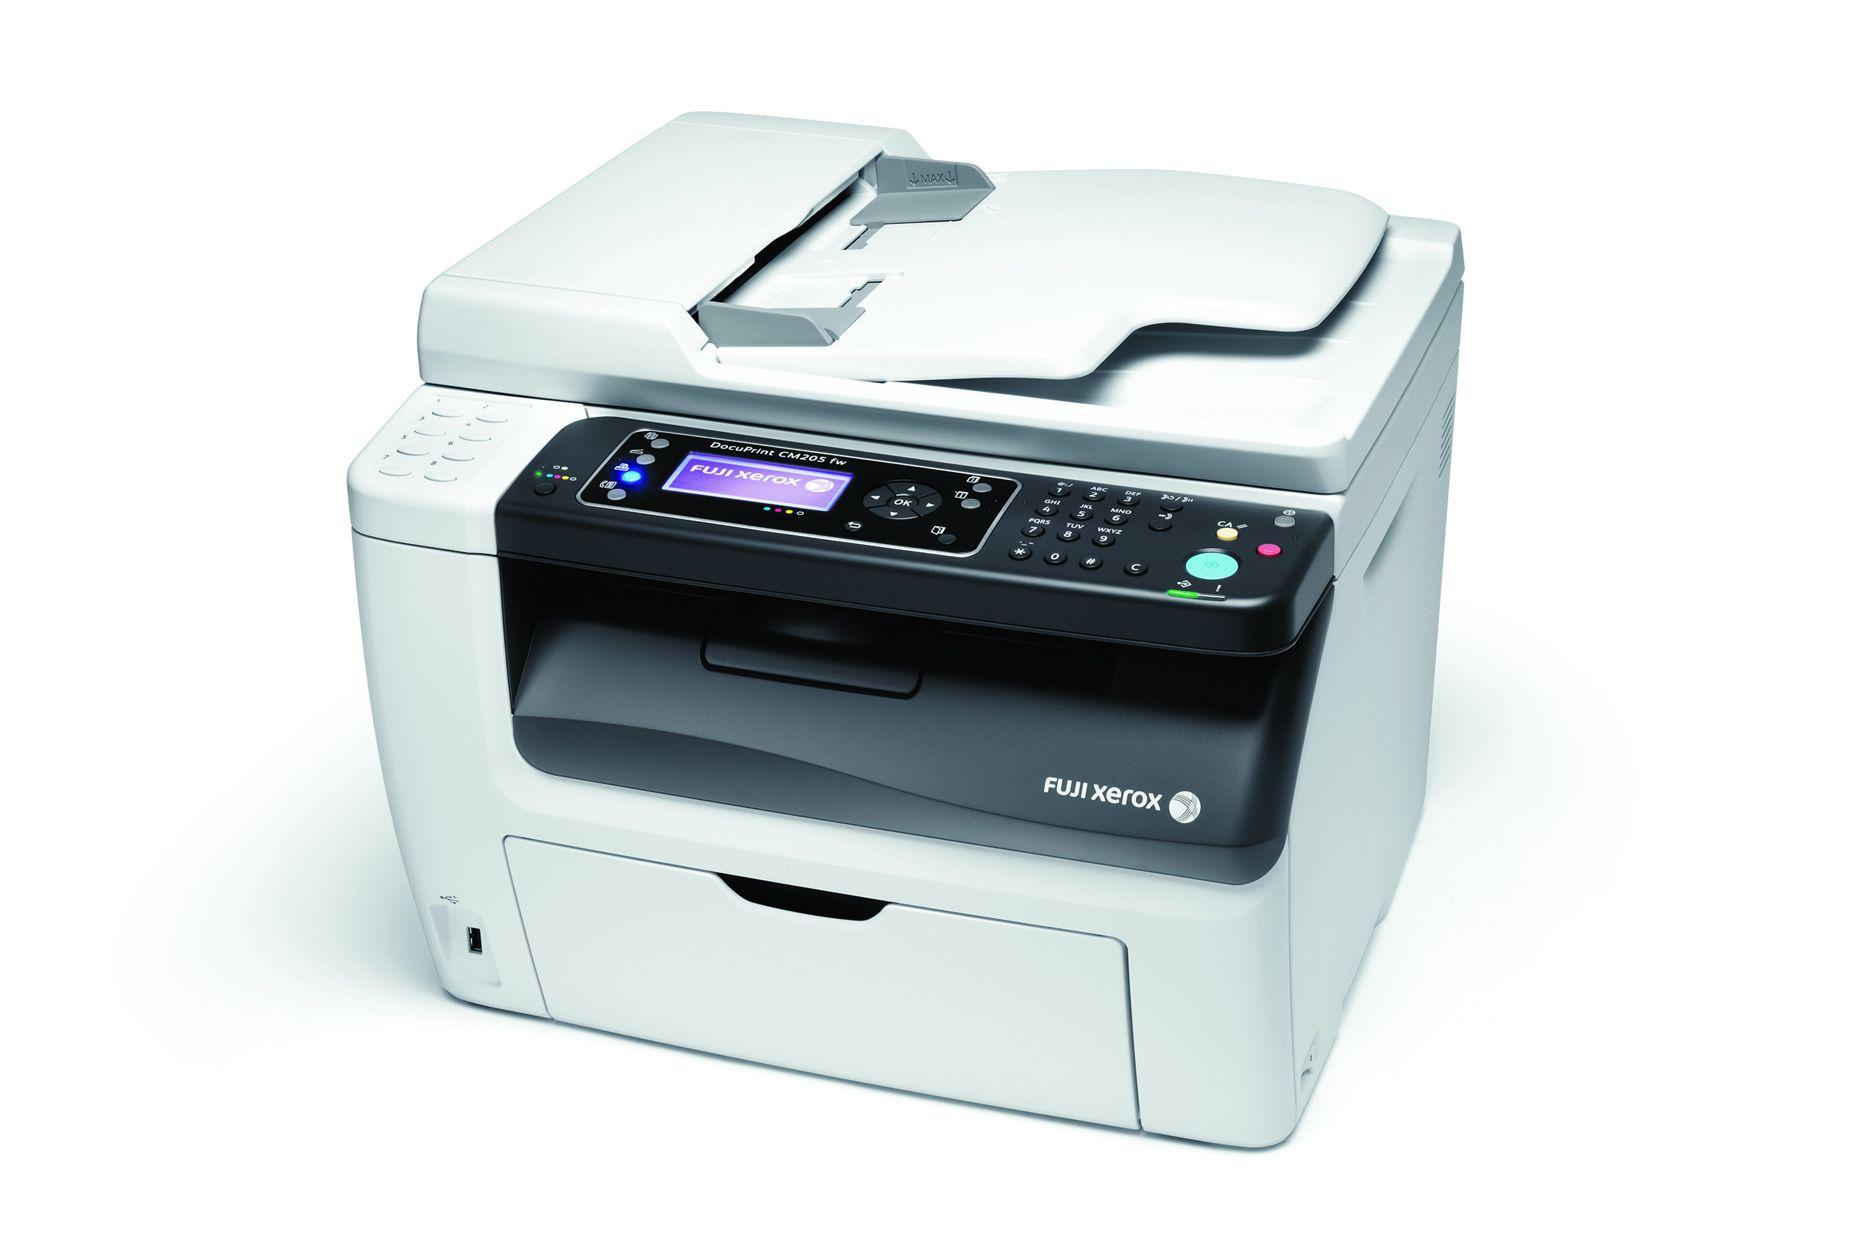 Pink Fuji Xerox Printer Latest Reviews Comparisons Stories